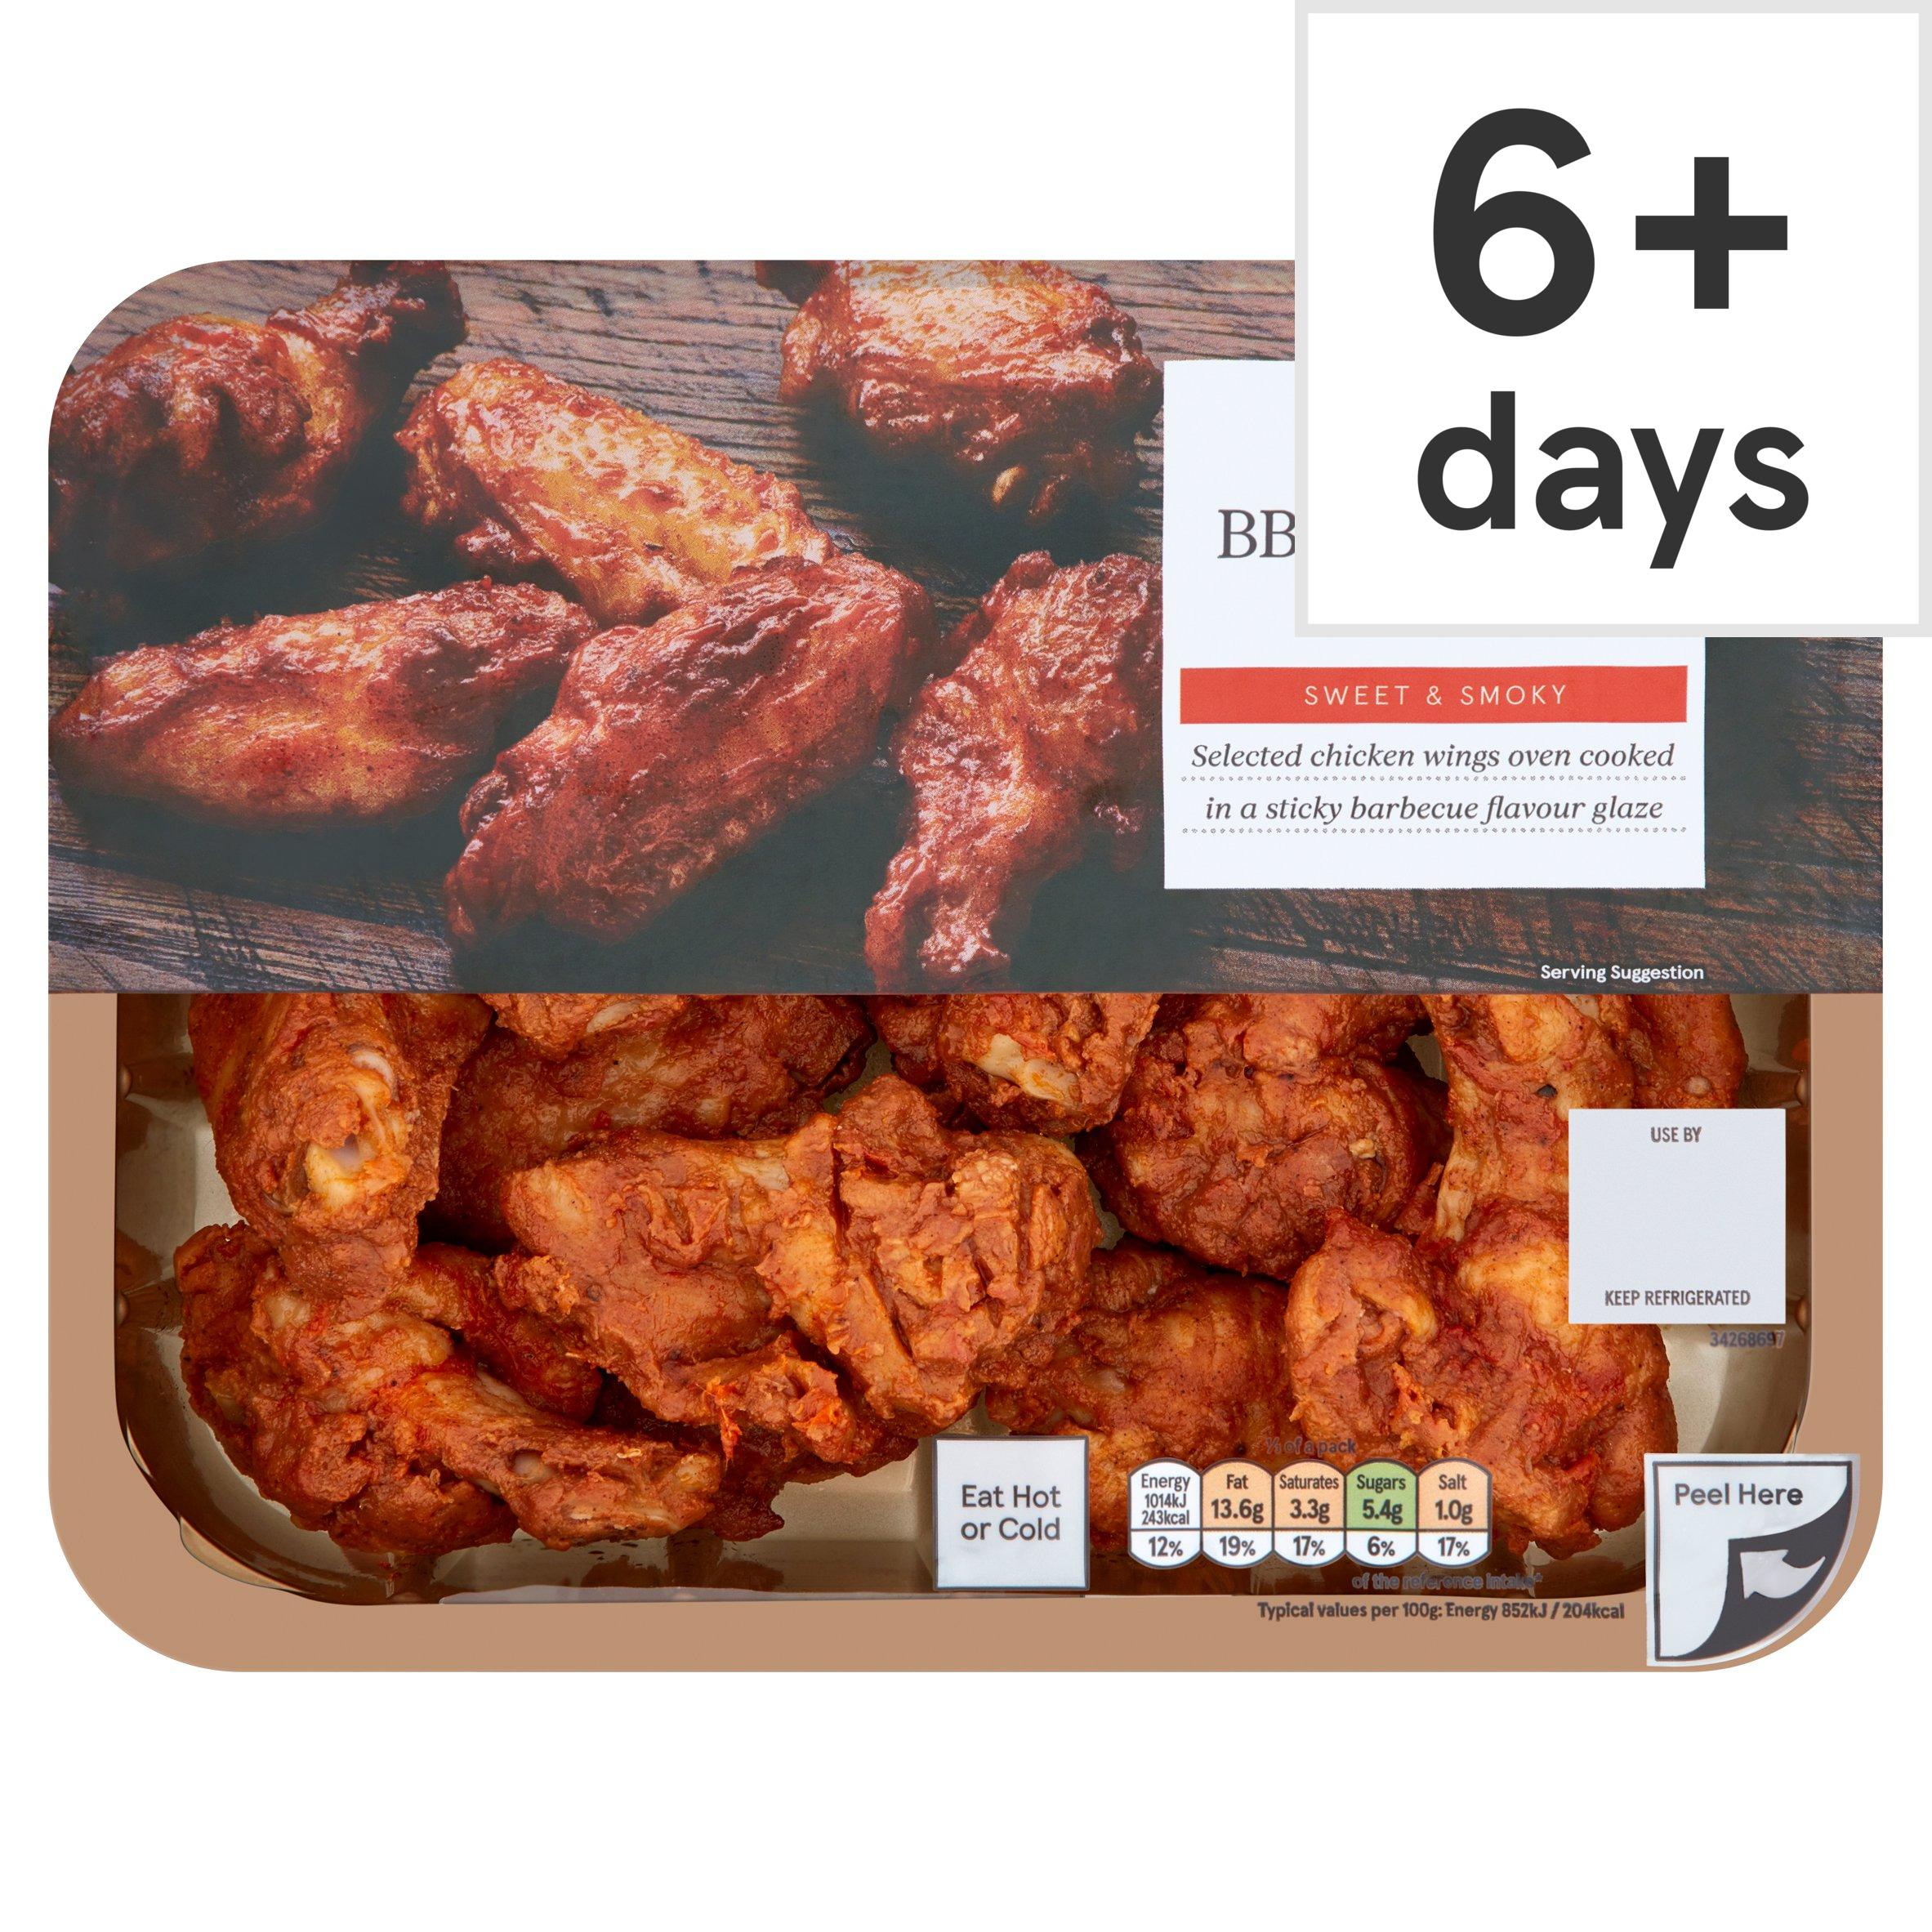 Tesco British Ready To Eat Bbq Roast Chicken Wings 525G